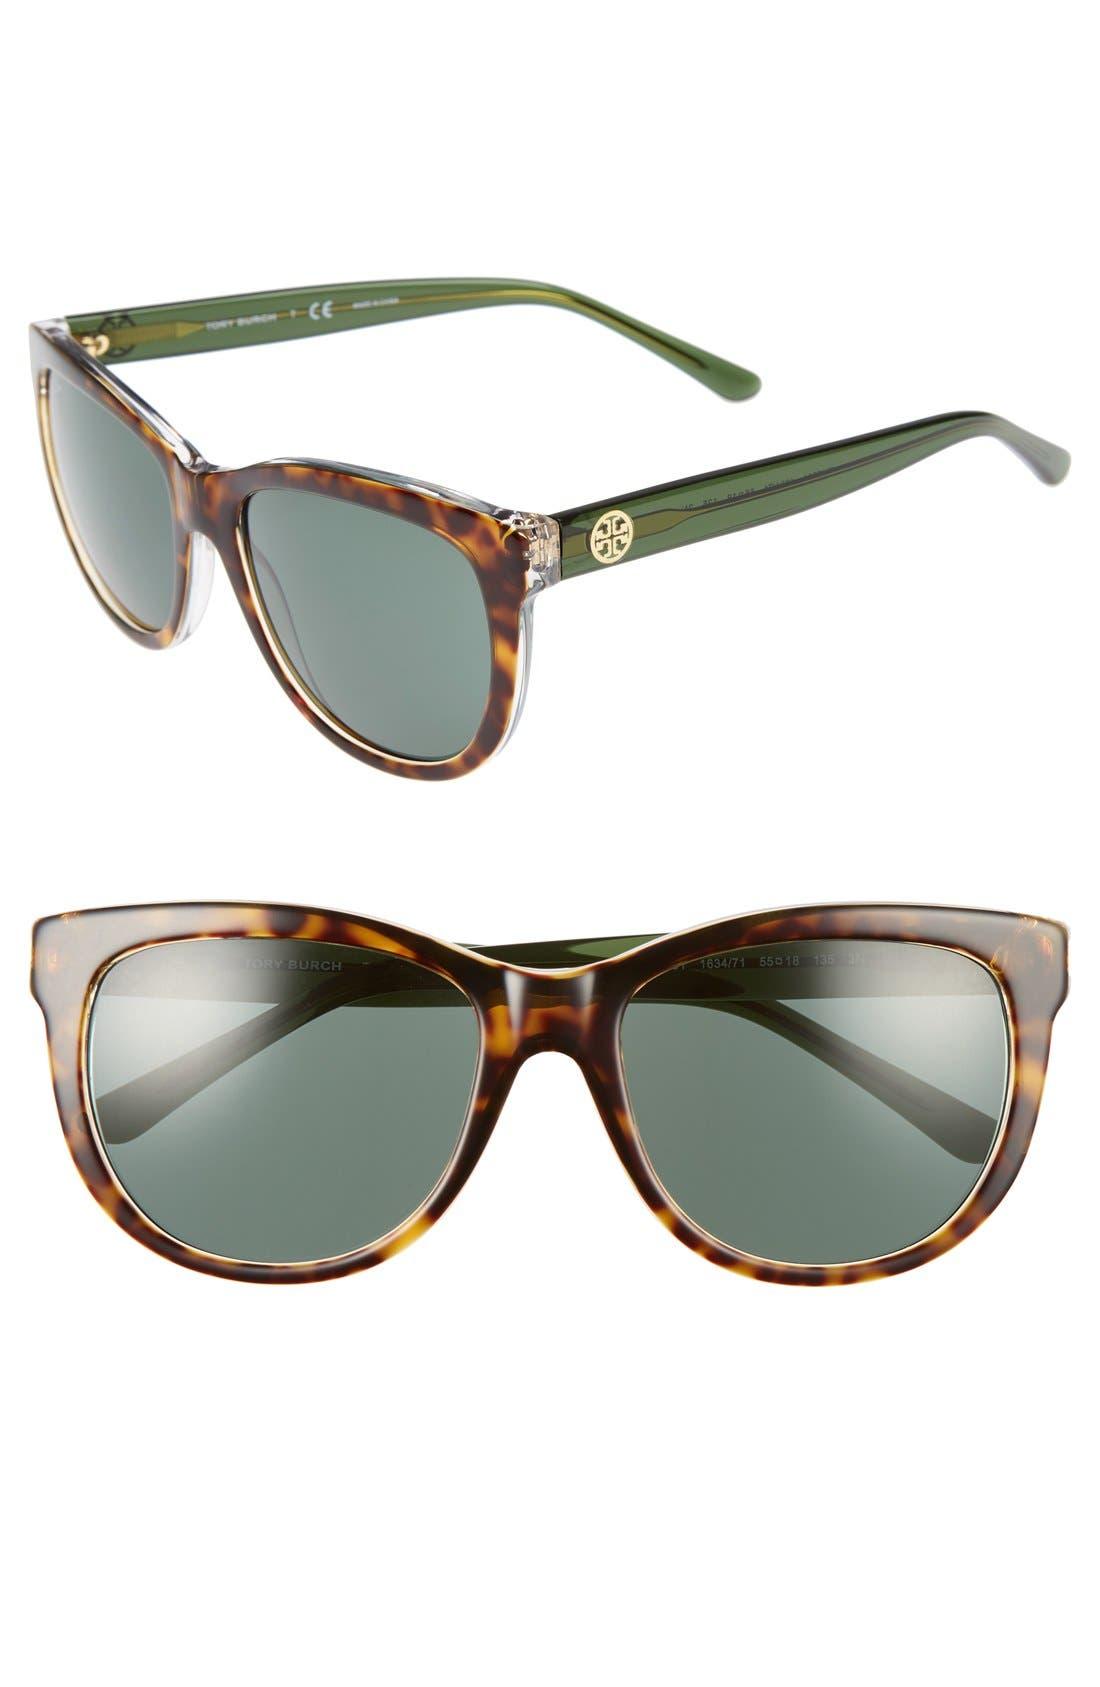 55mm Sunglasses,                             Main thumbnail 1, color,                             300